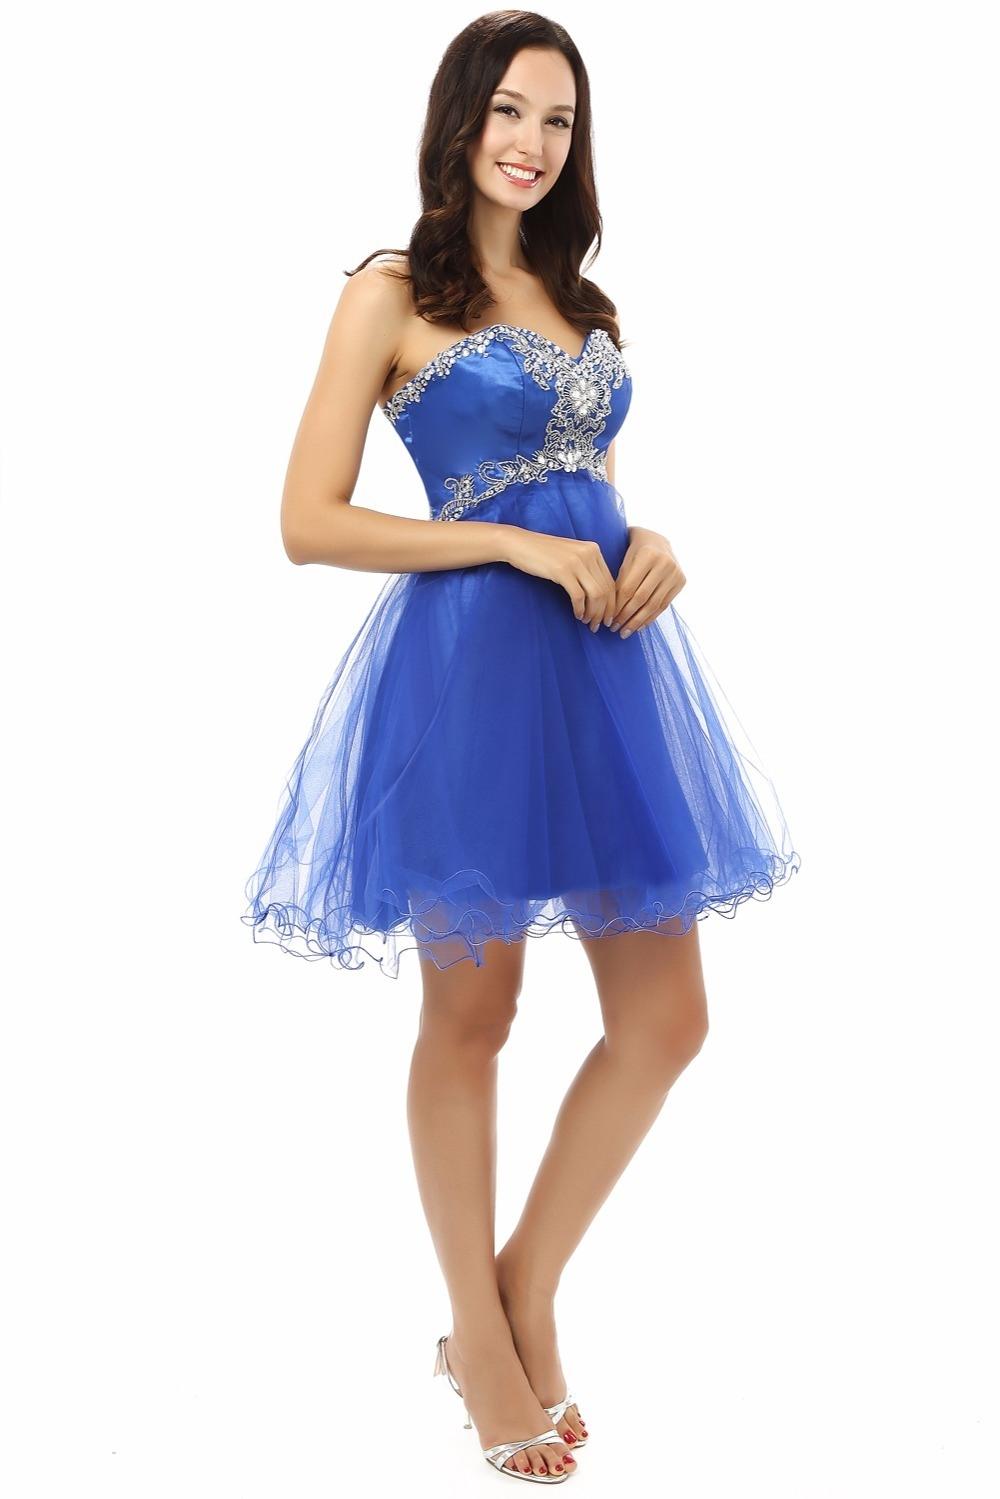 20 Schön Kleid Blau Kurz GalerieAbend Genial Kleid Blau Kurz Spezialgebiet